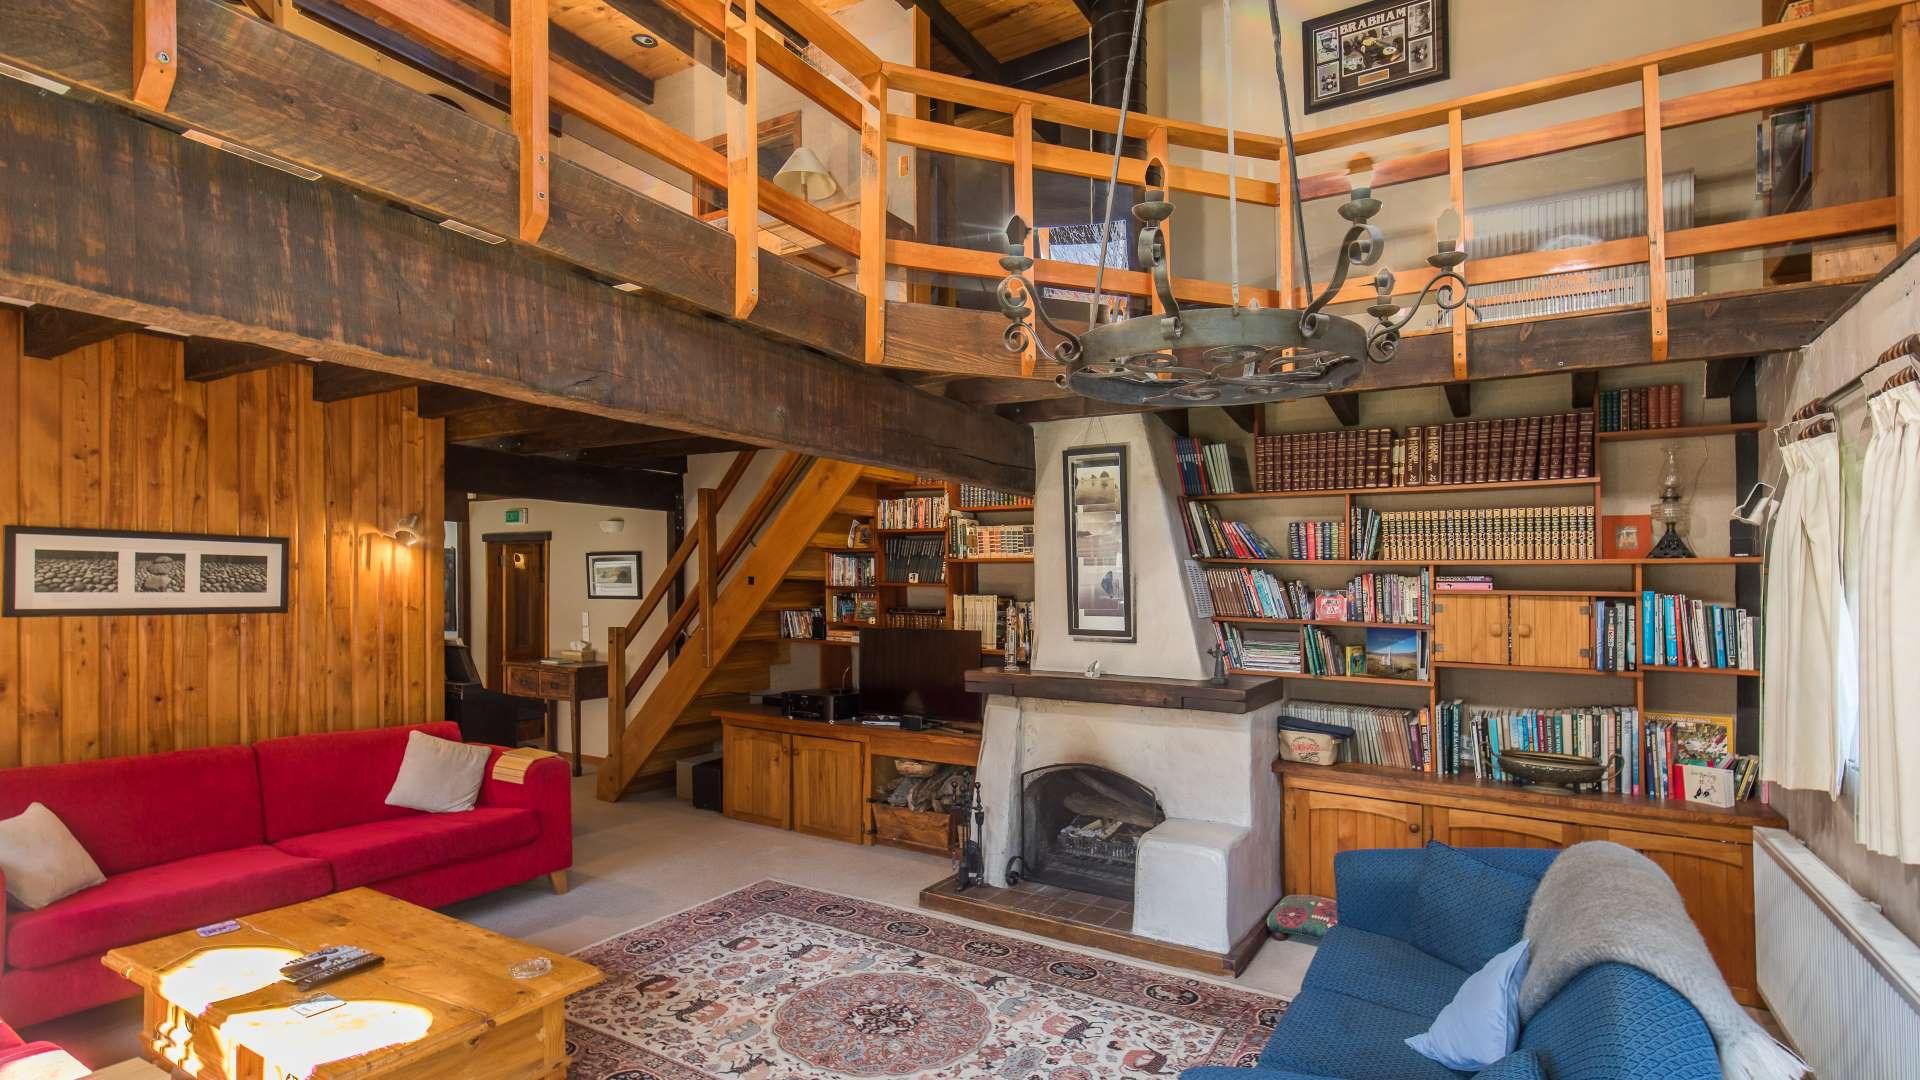 Wanaka Stonehouse Lodge - Fire